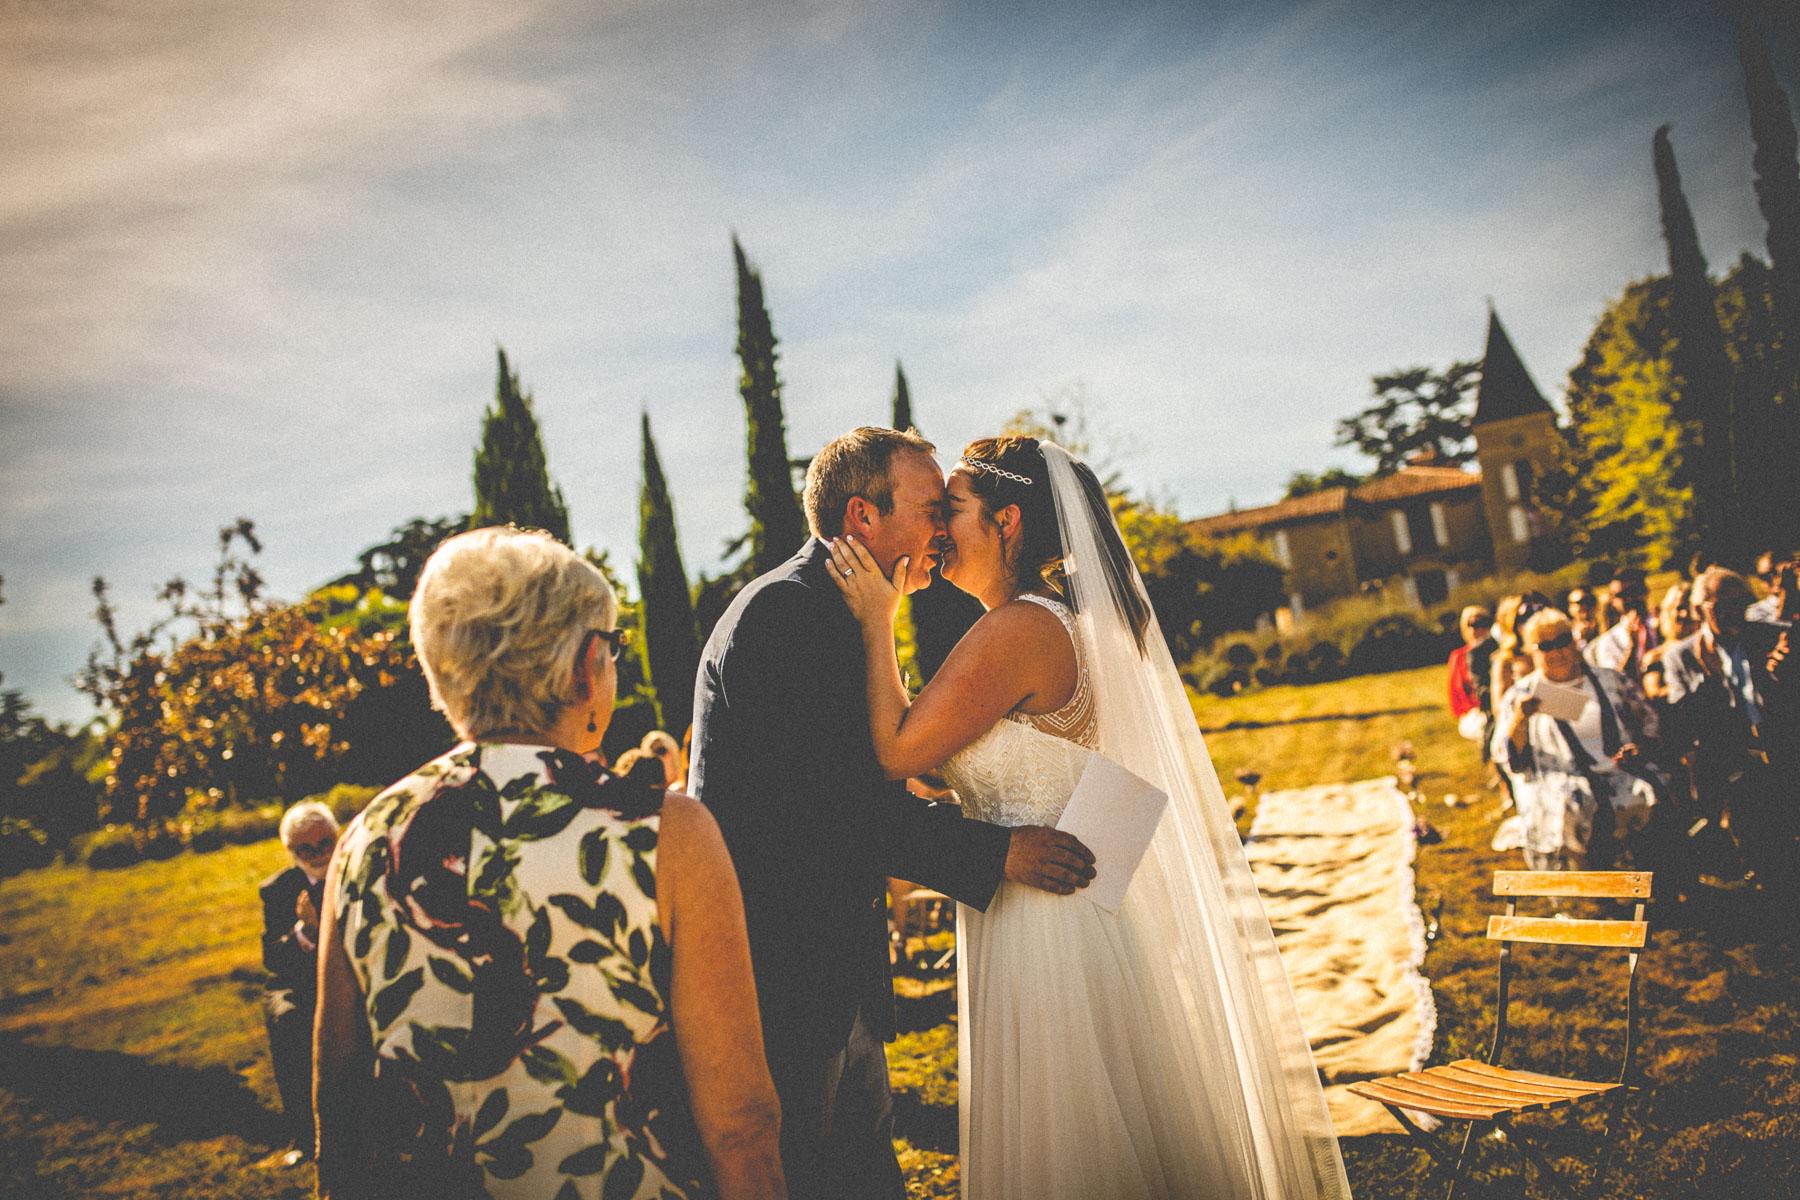 destination wedding photography - u got the love wedding photography-333184.jpg